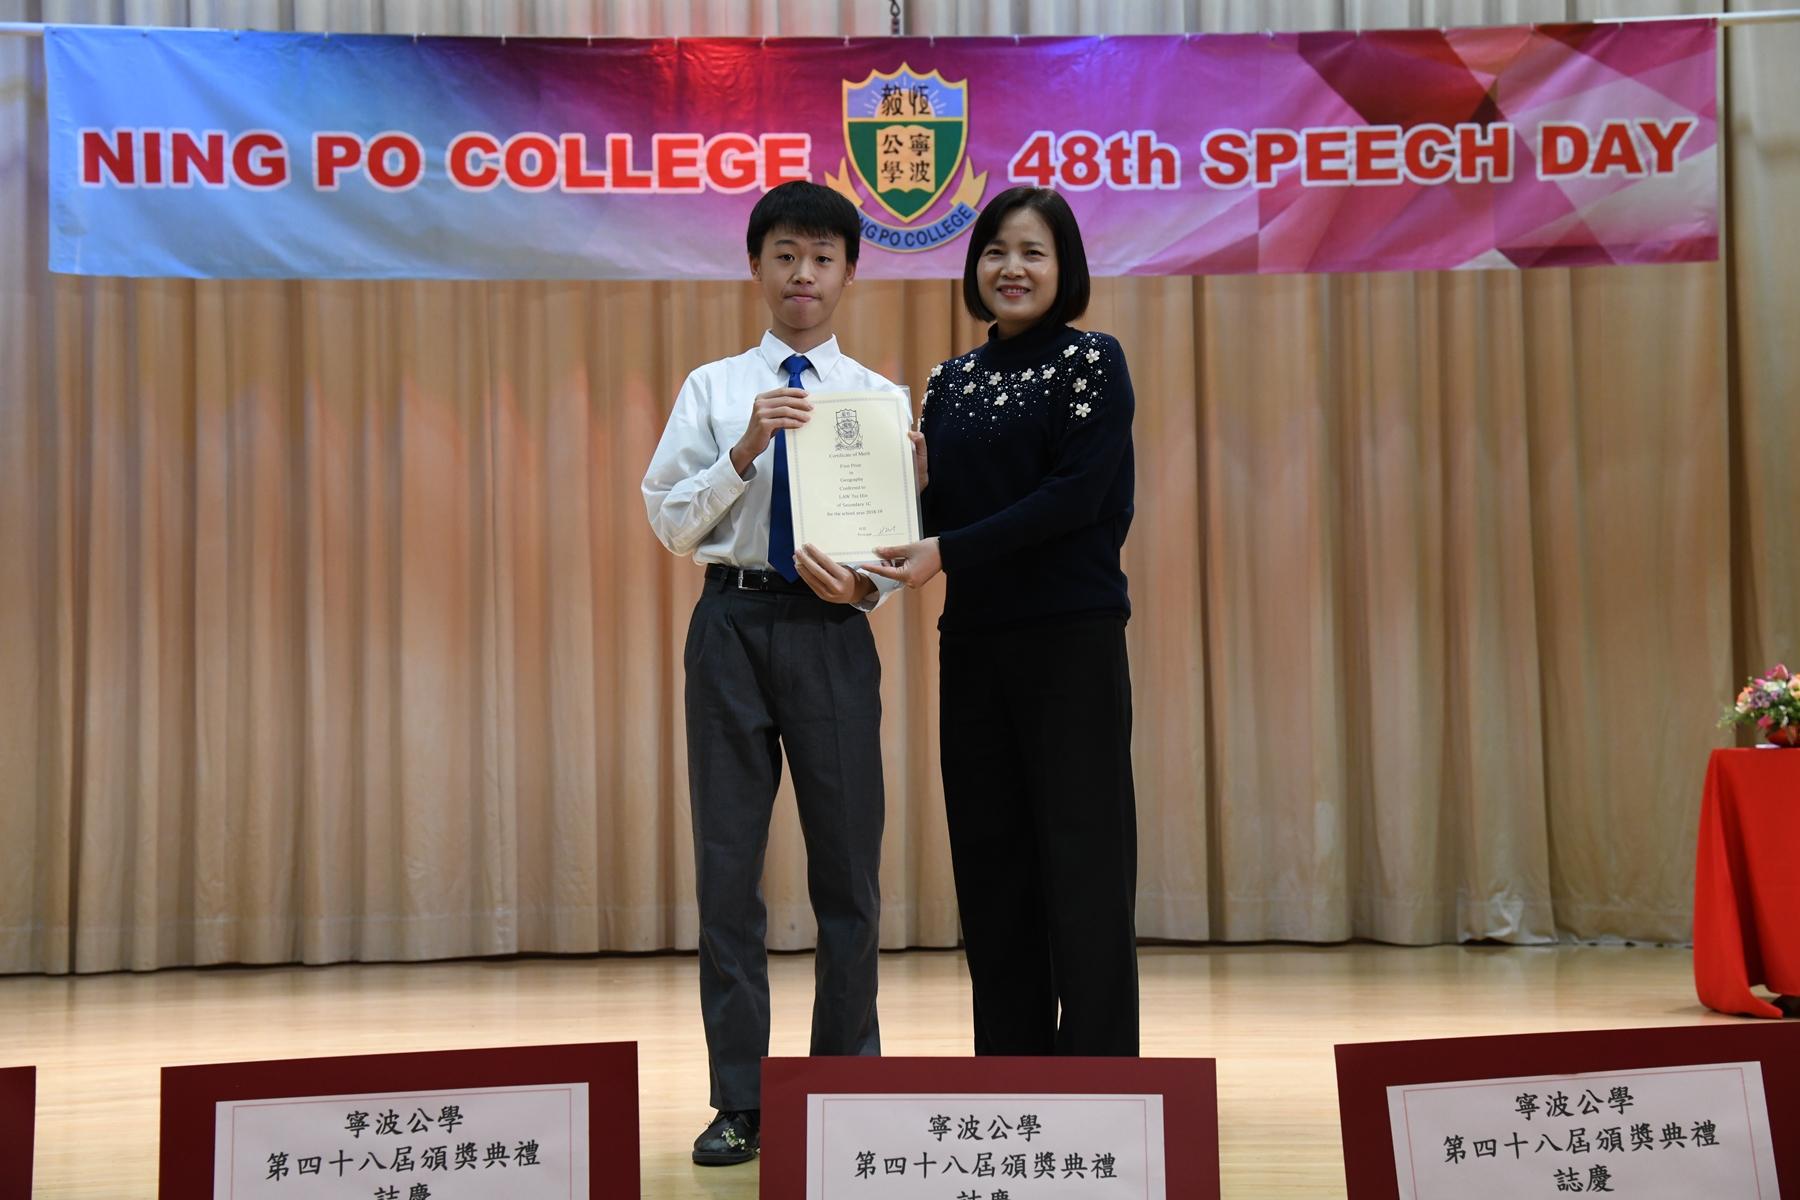 http://npc.edu.hk/sites/default/files/dsc_0754_1.jpg